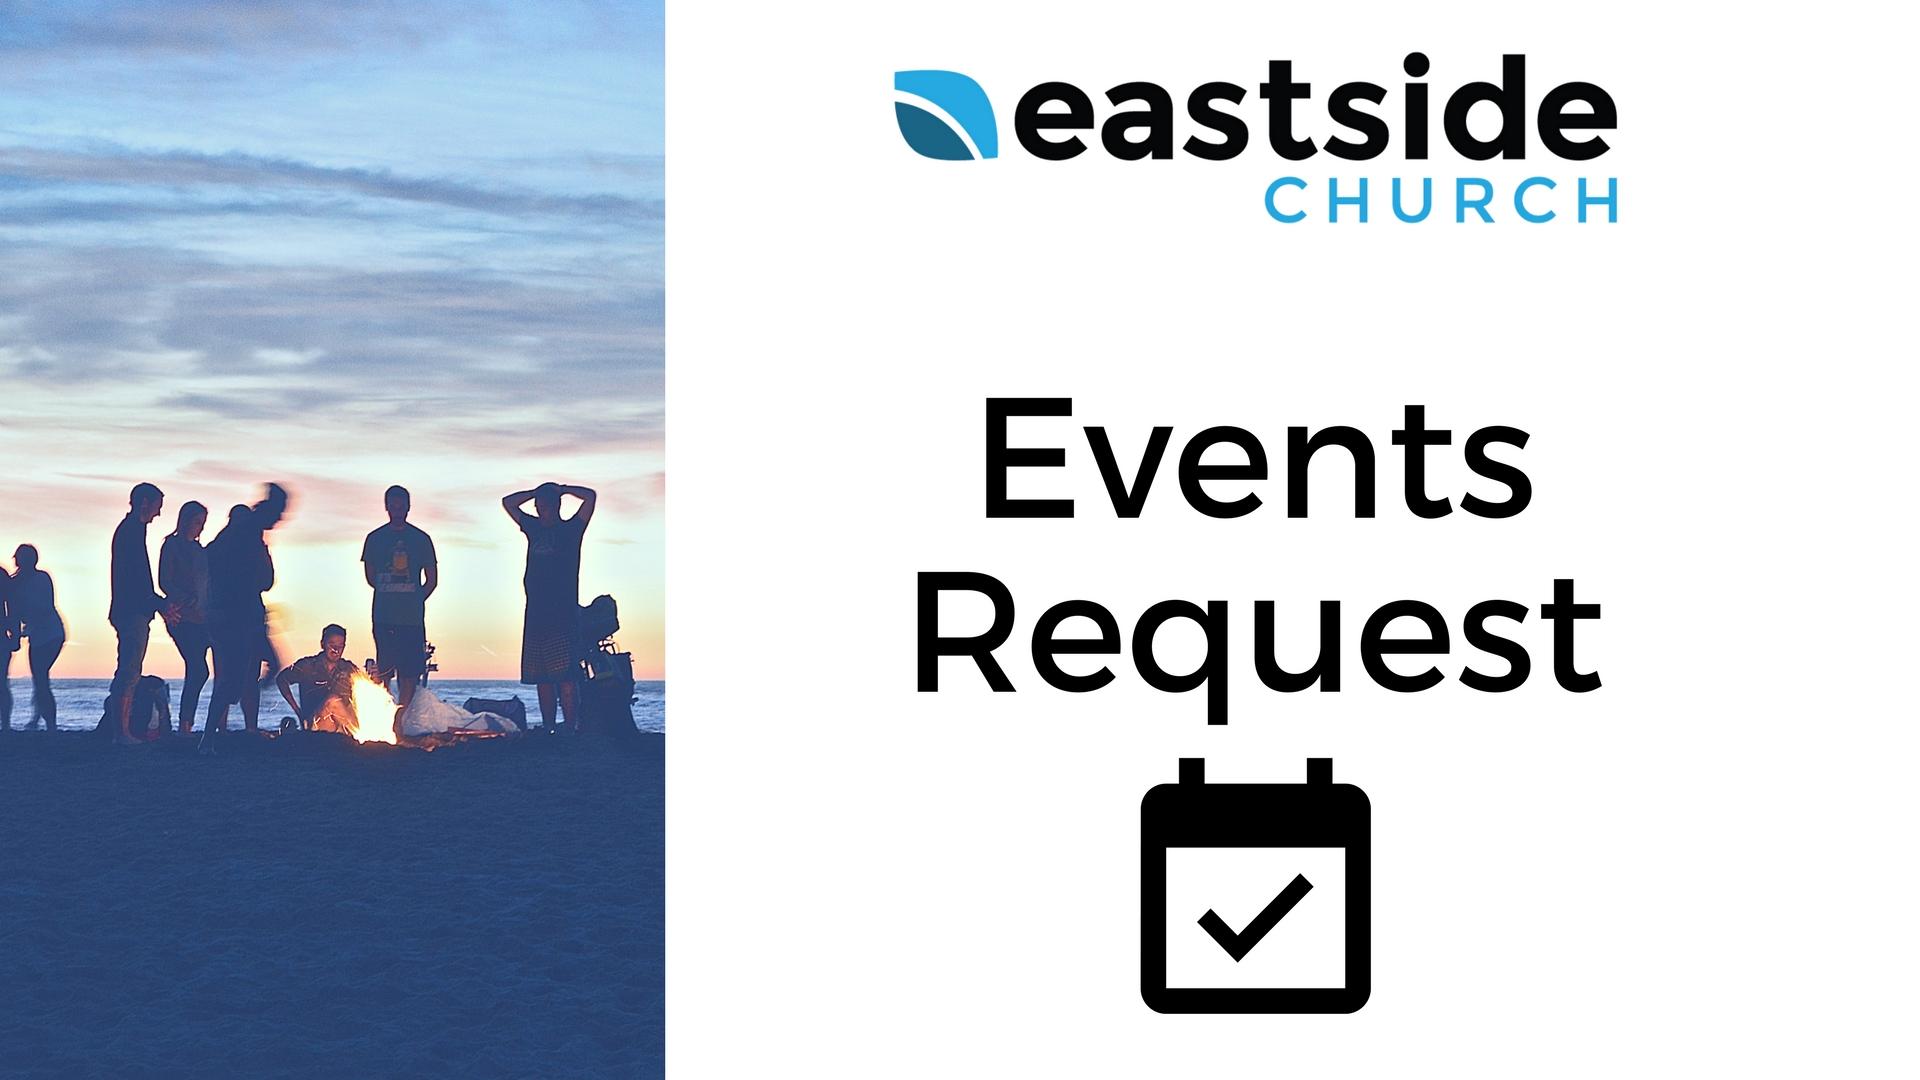 Eastside events